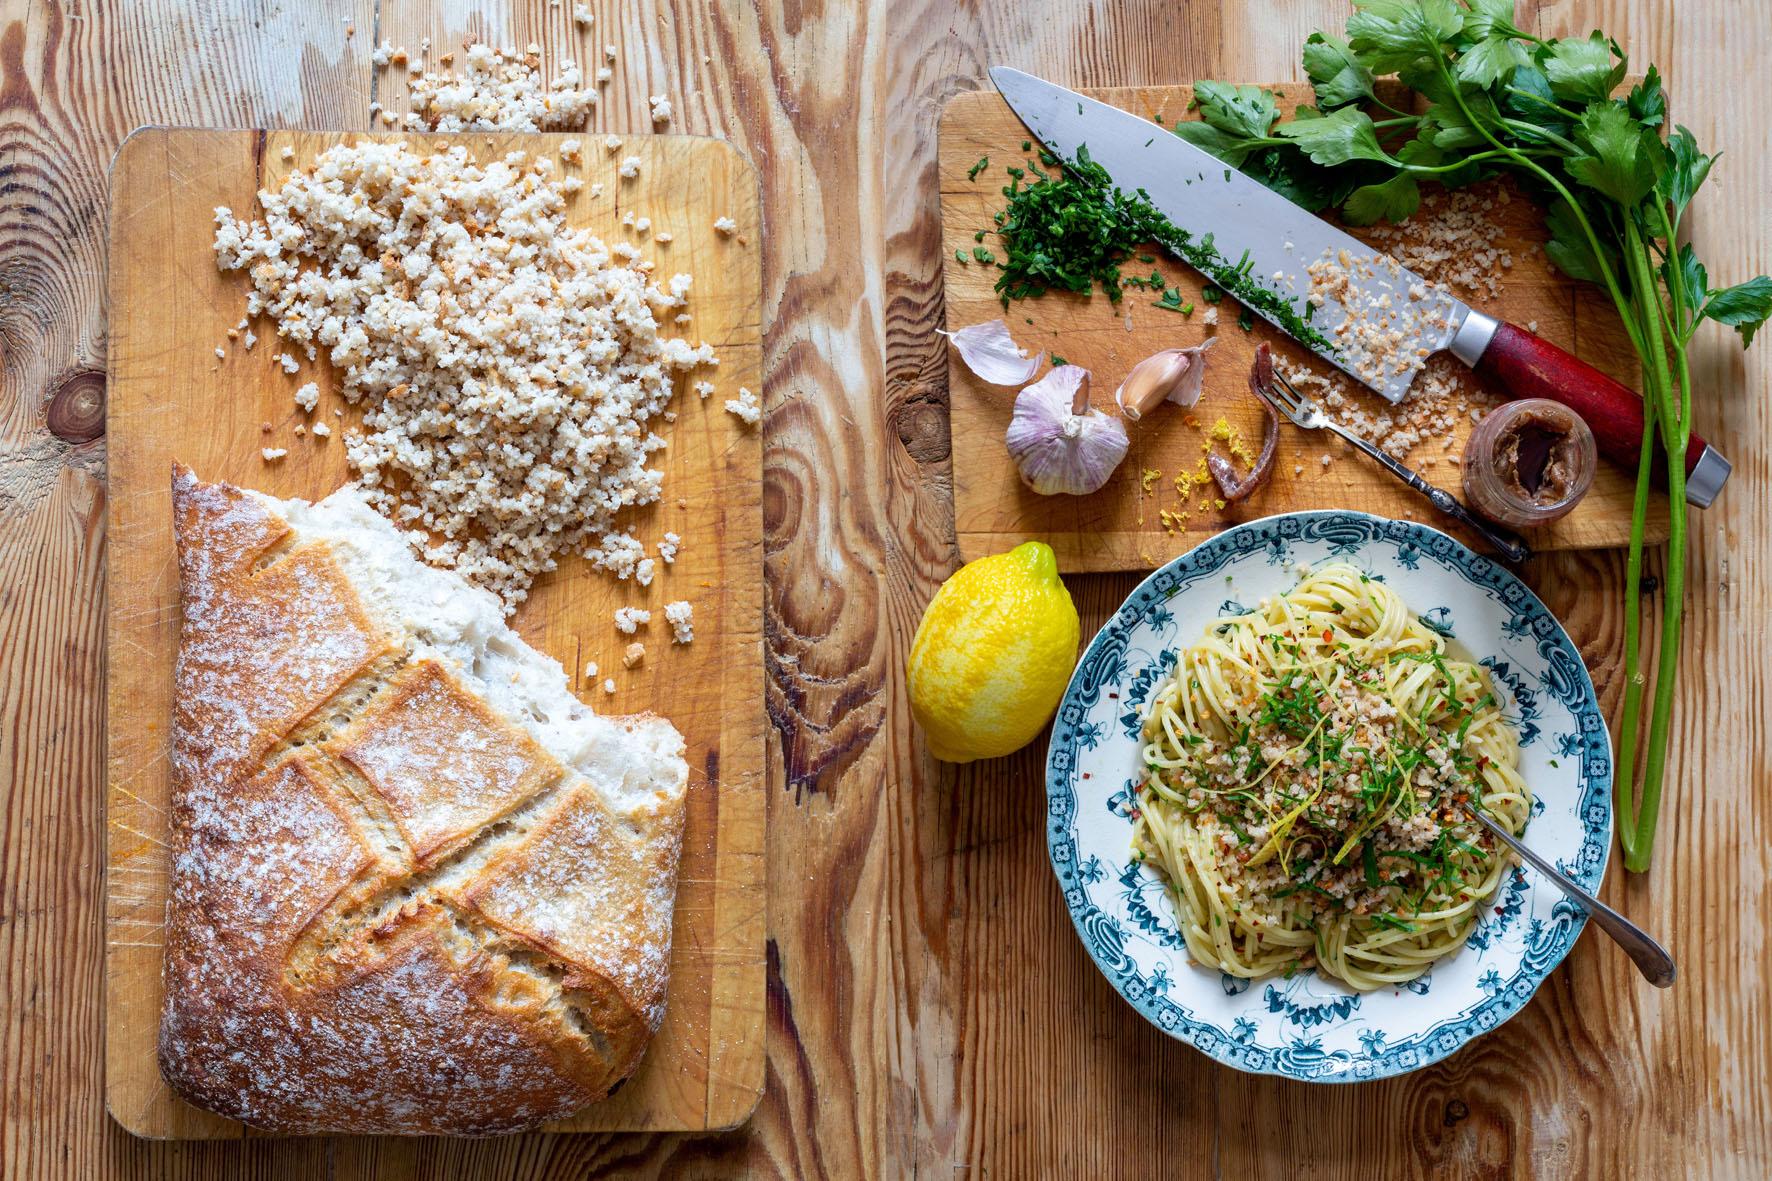 skogtillbord-pasta-pangrattato-feb21